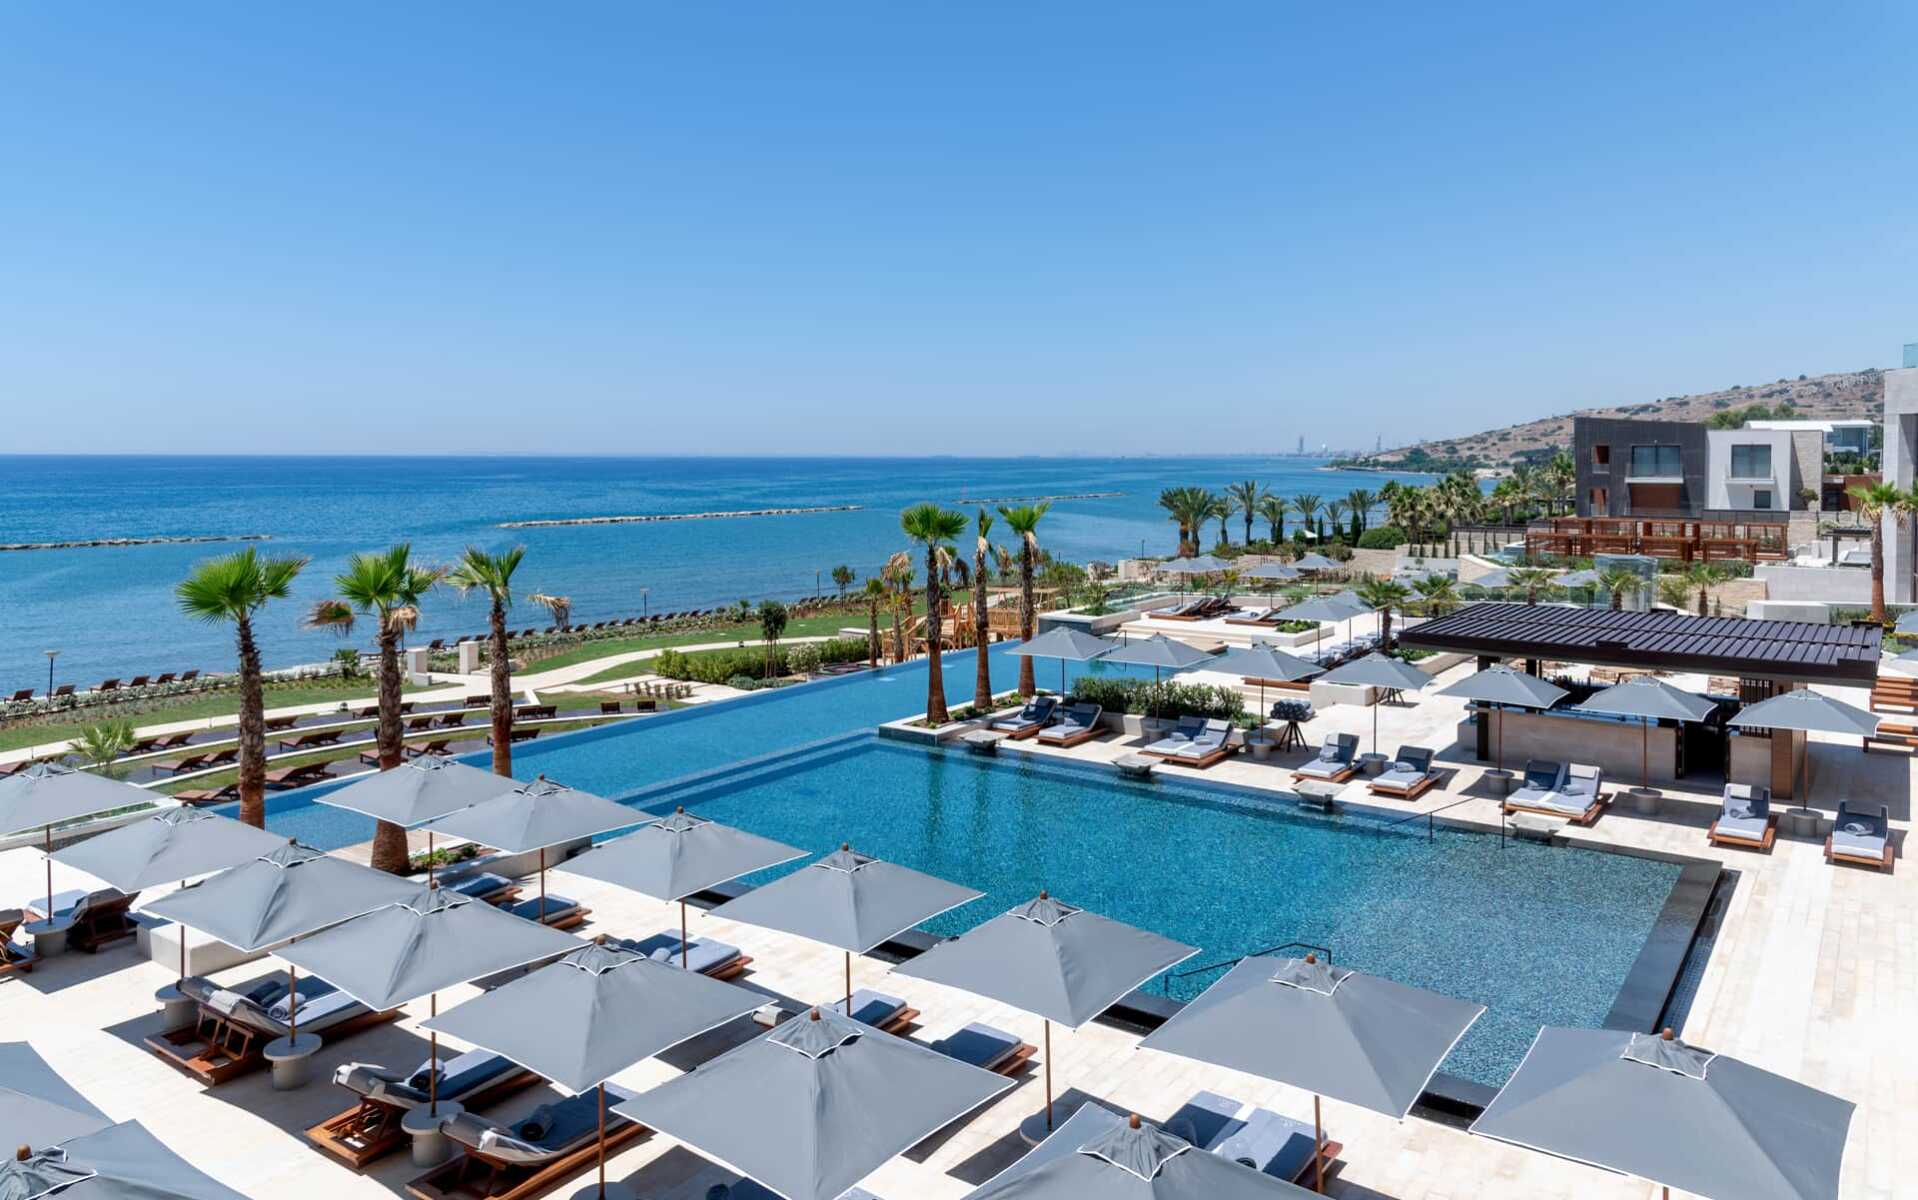 Amara Hotel-Limassol-Jumbo Travel- The pool bar